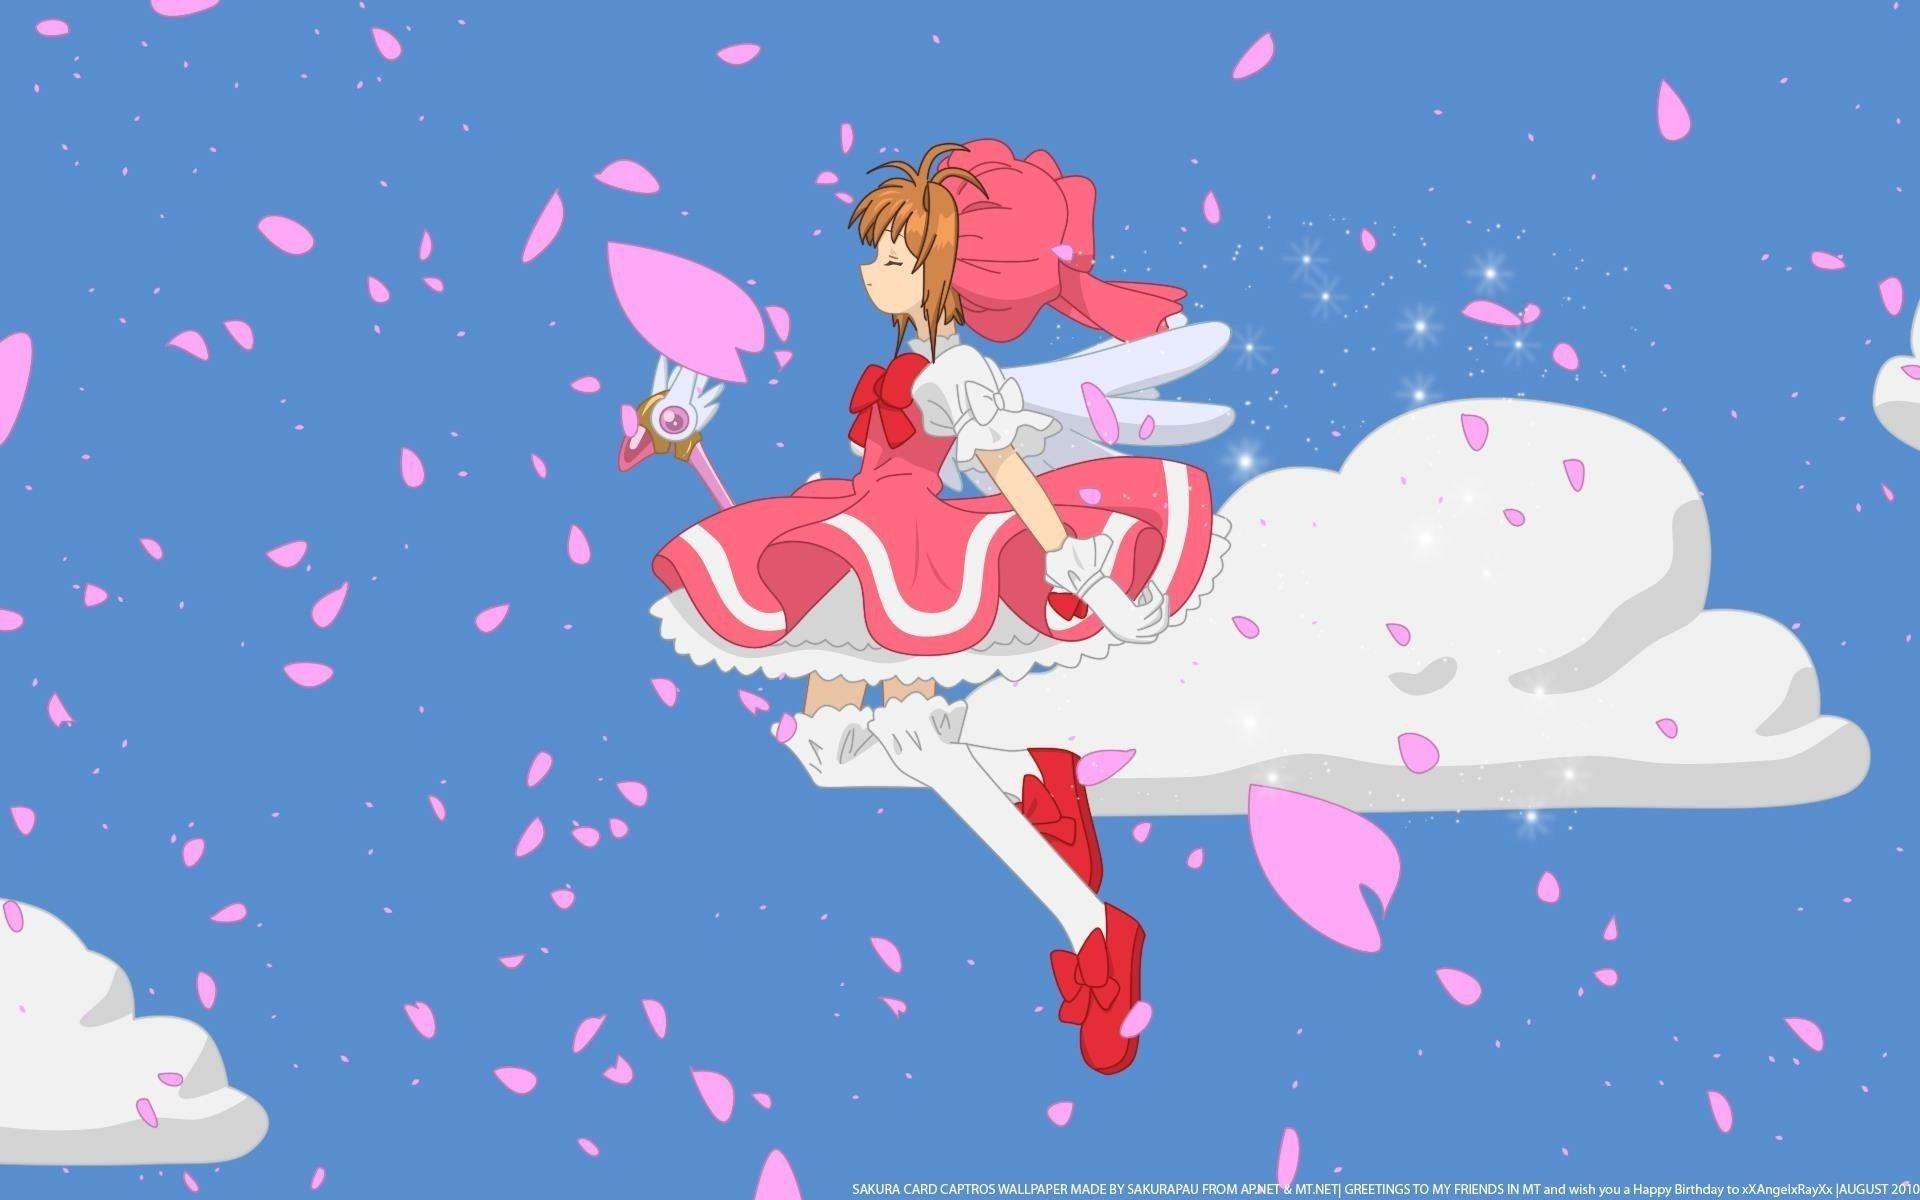 Beautiful Cardcaptor Sakura Wallpaper Sakura Card Cardcaptor Sakura Cardcaptor